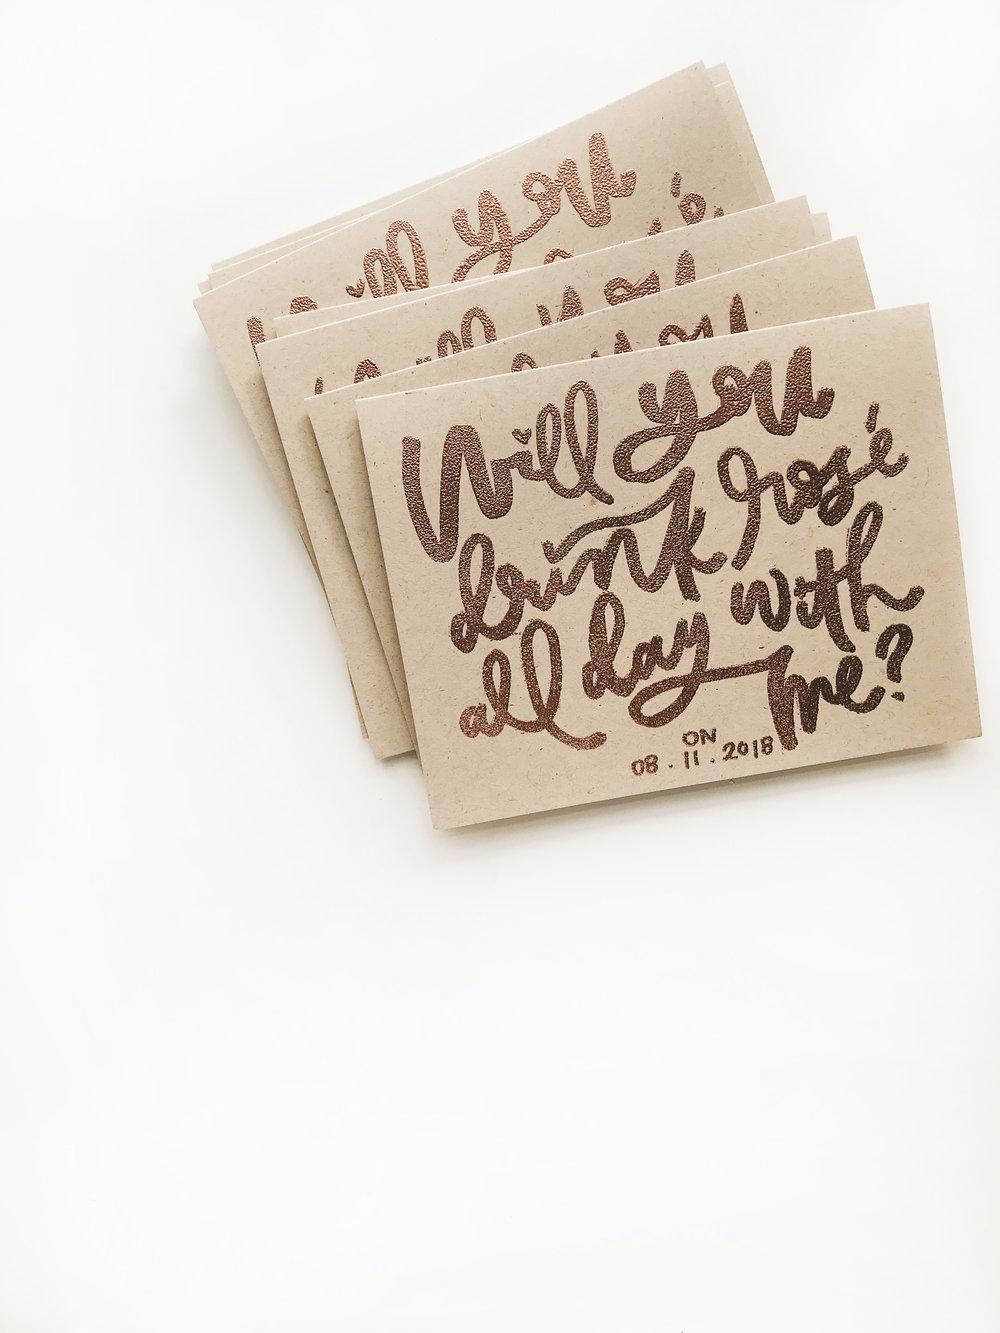 heylux_bridesmaids_card_handlettered_wedding.JPG